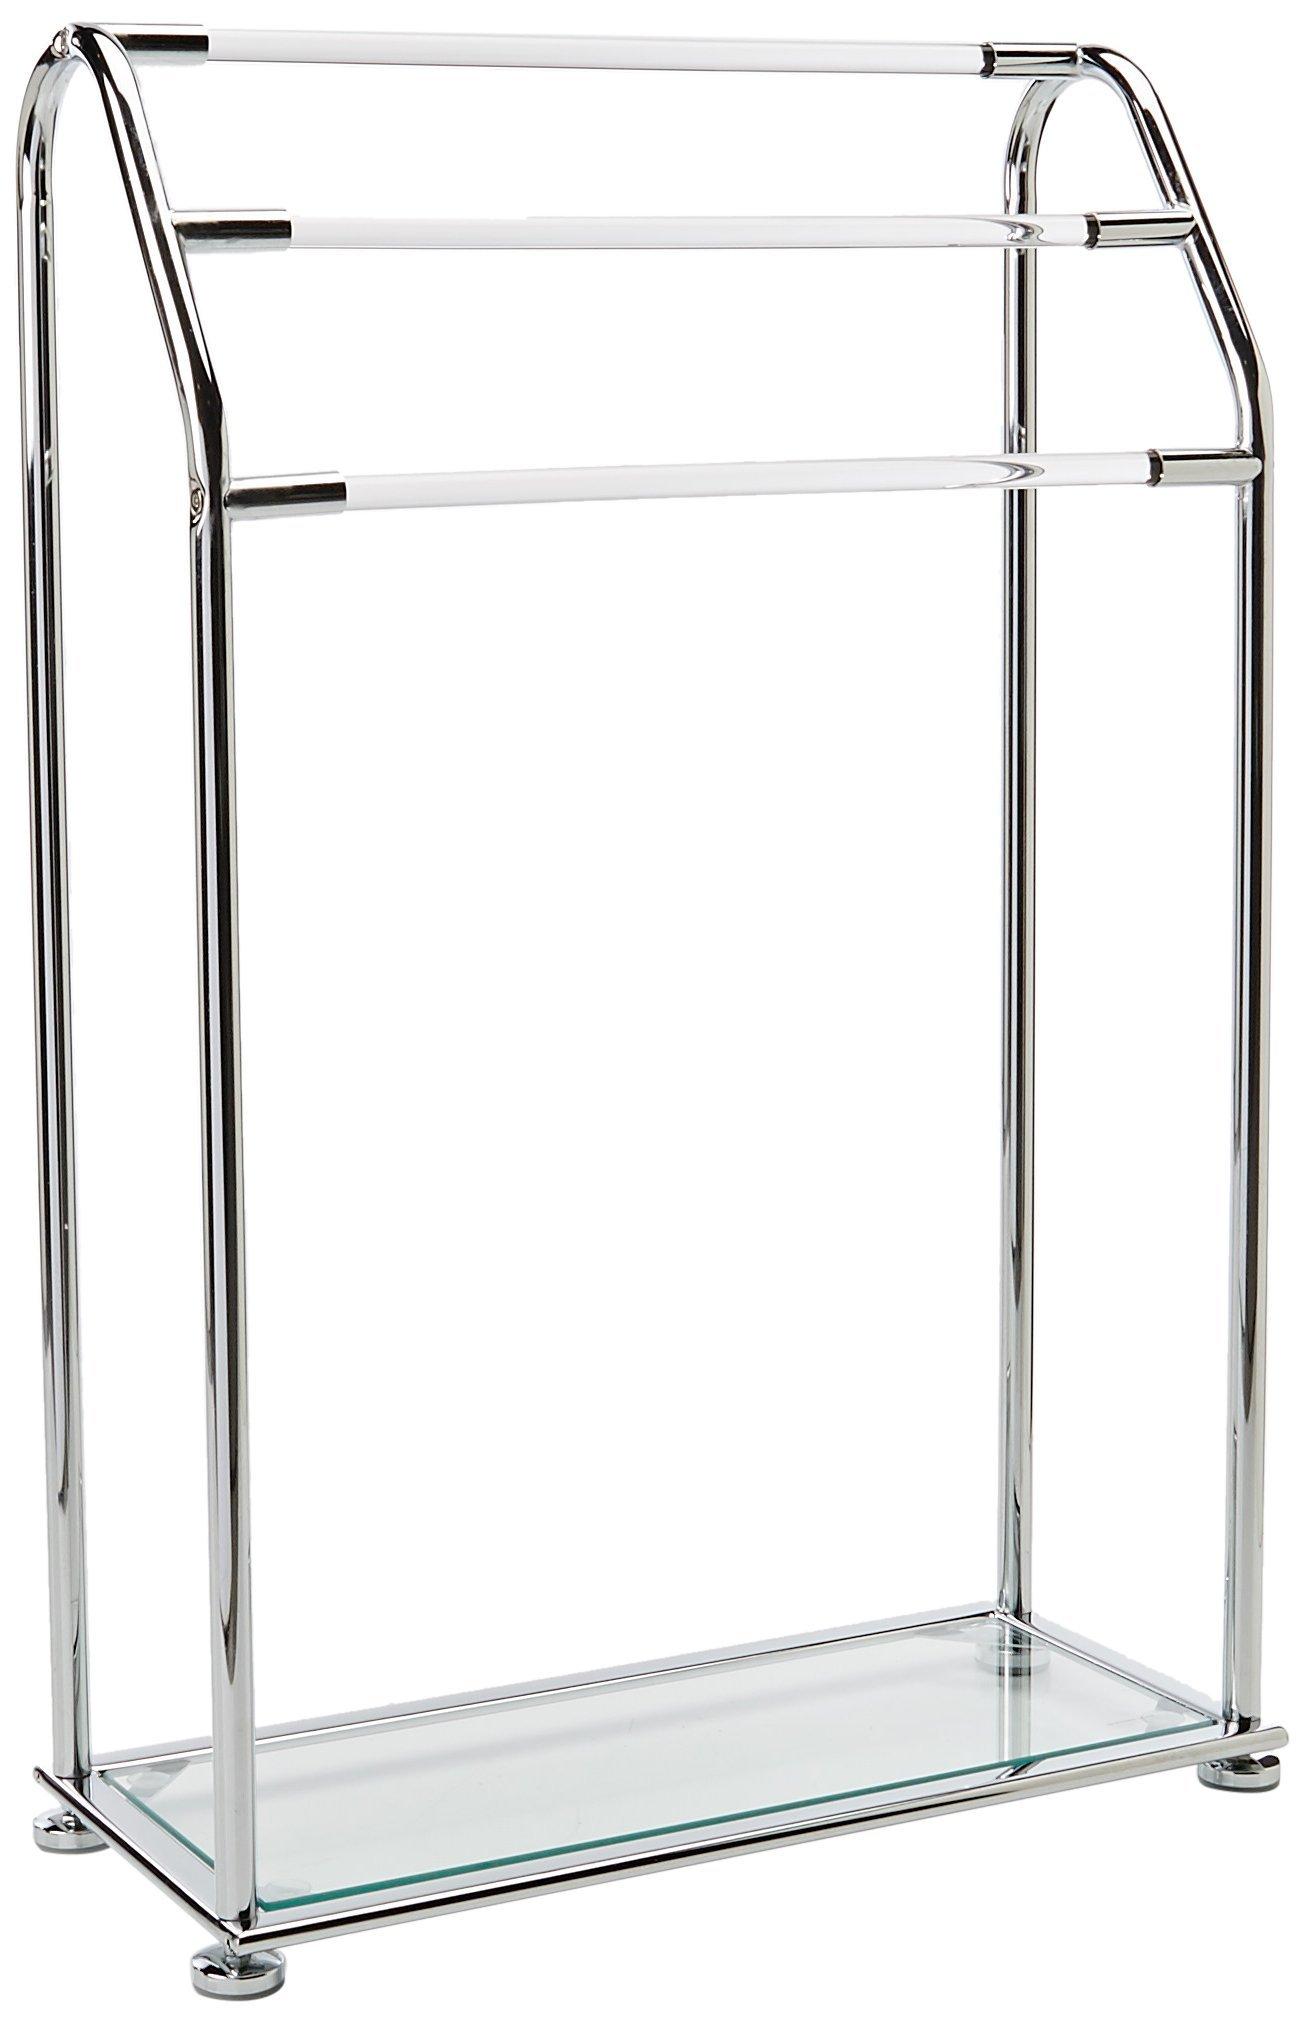 Organize It All 3 Bar Bathroom Towel Drying Rack & Holder with Shelf , Chrome by Organize It All